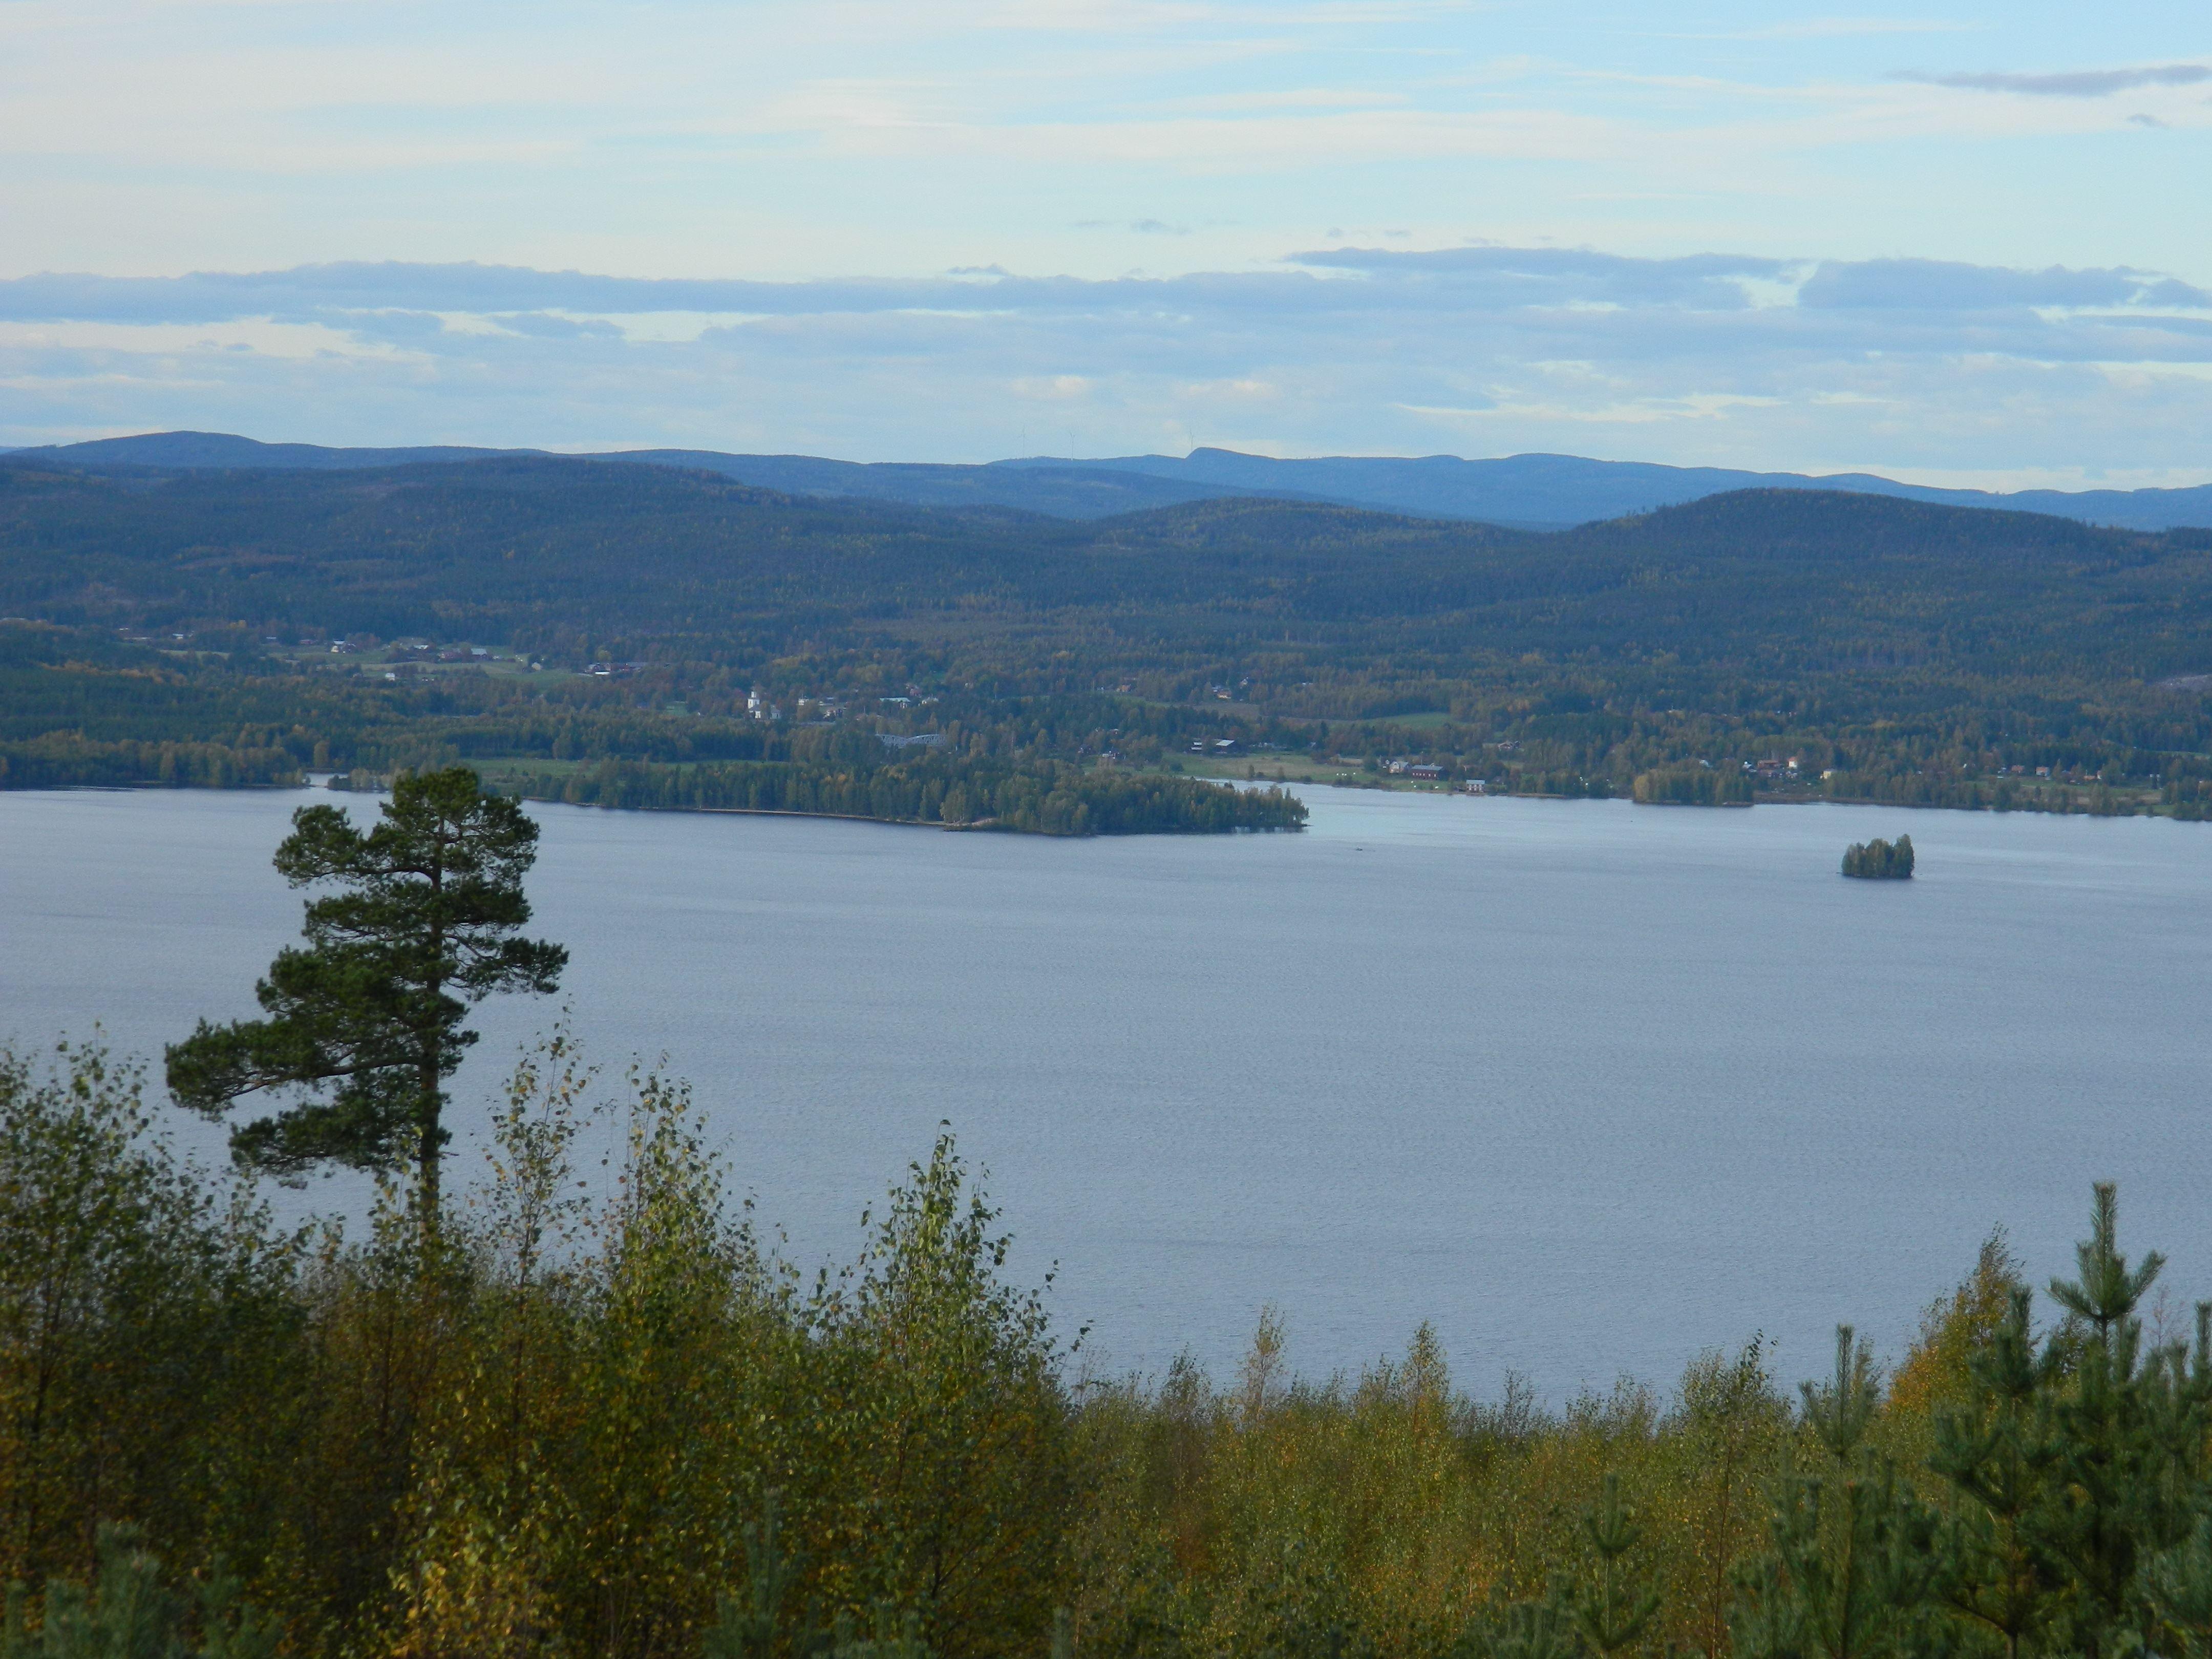 Utsiktsplats Digerberget